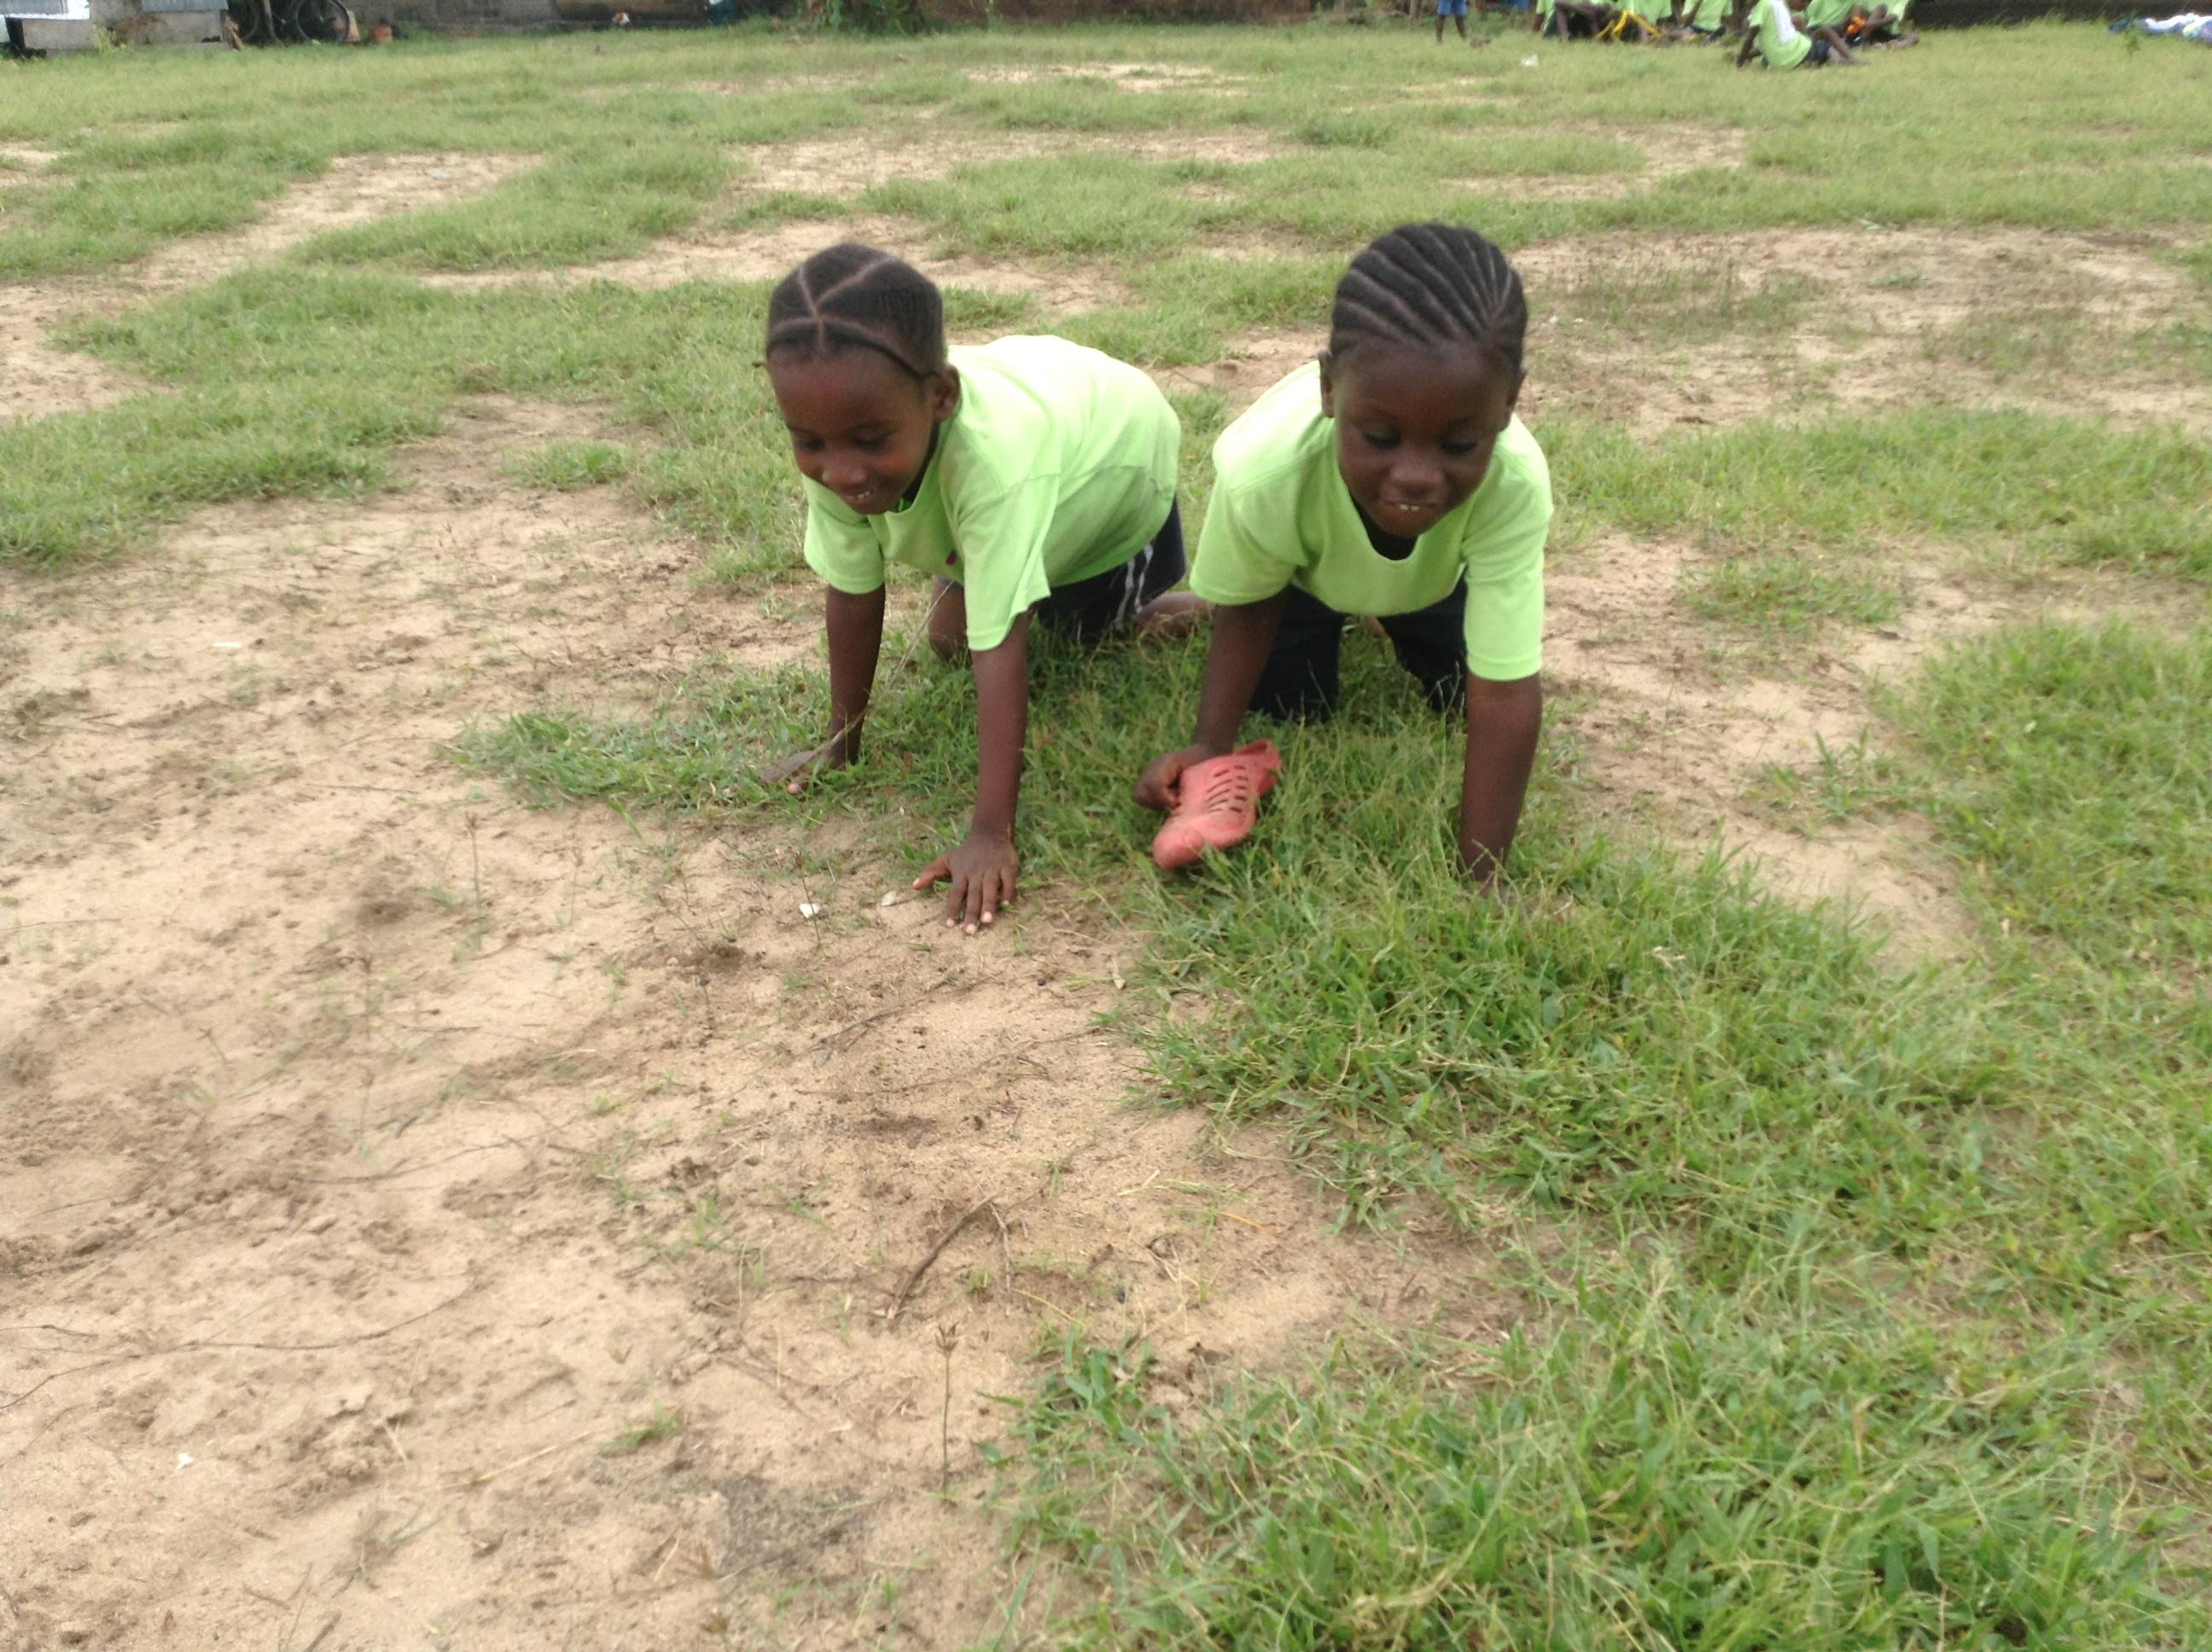 Laura_and_Mwajuma_3_legged_race.JPG